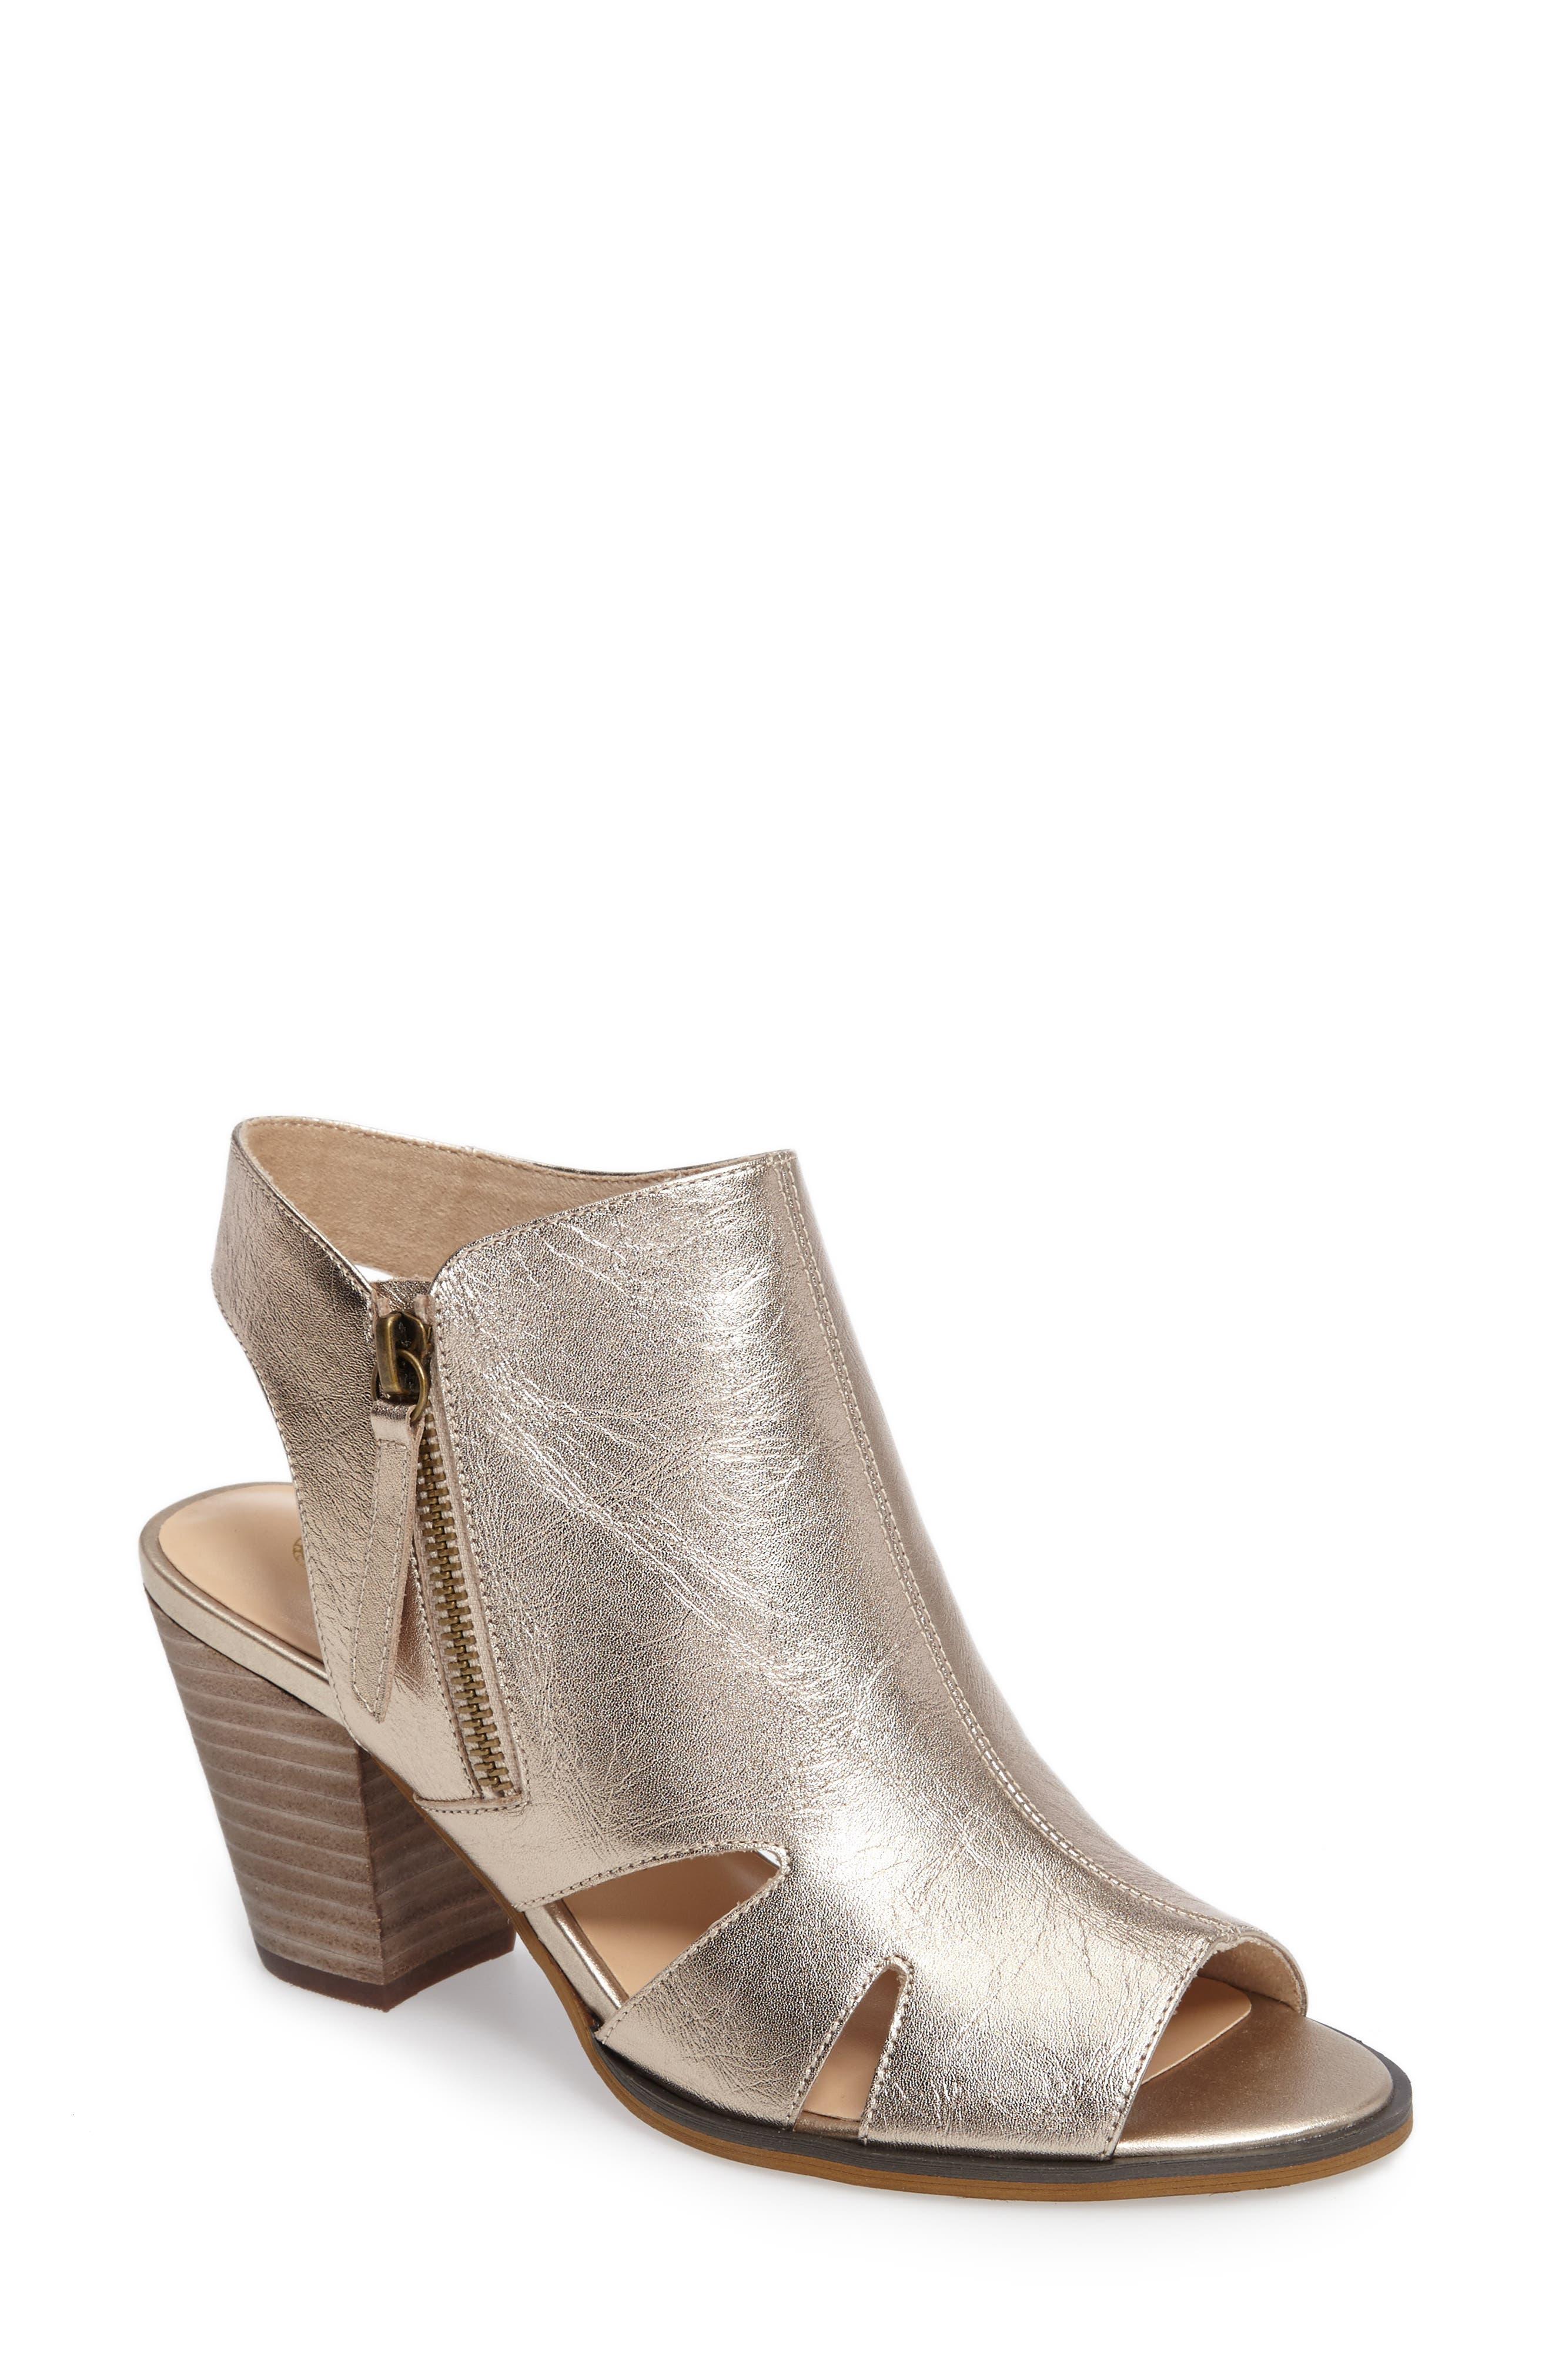 Alternate Image 1 Selected - Bella Vita Kimmy Cutout Sandal (Women)